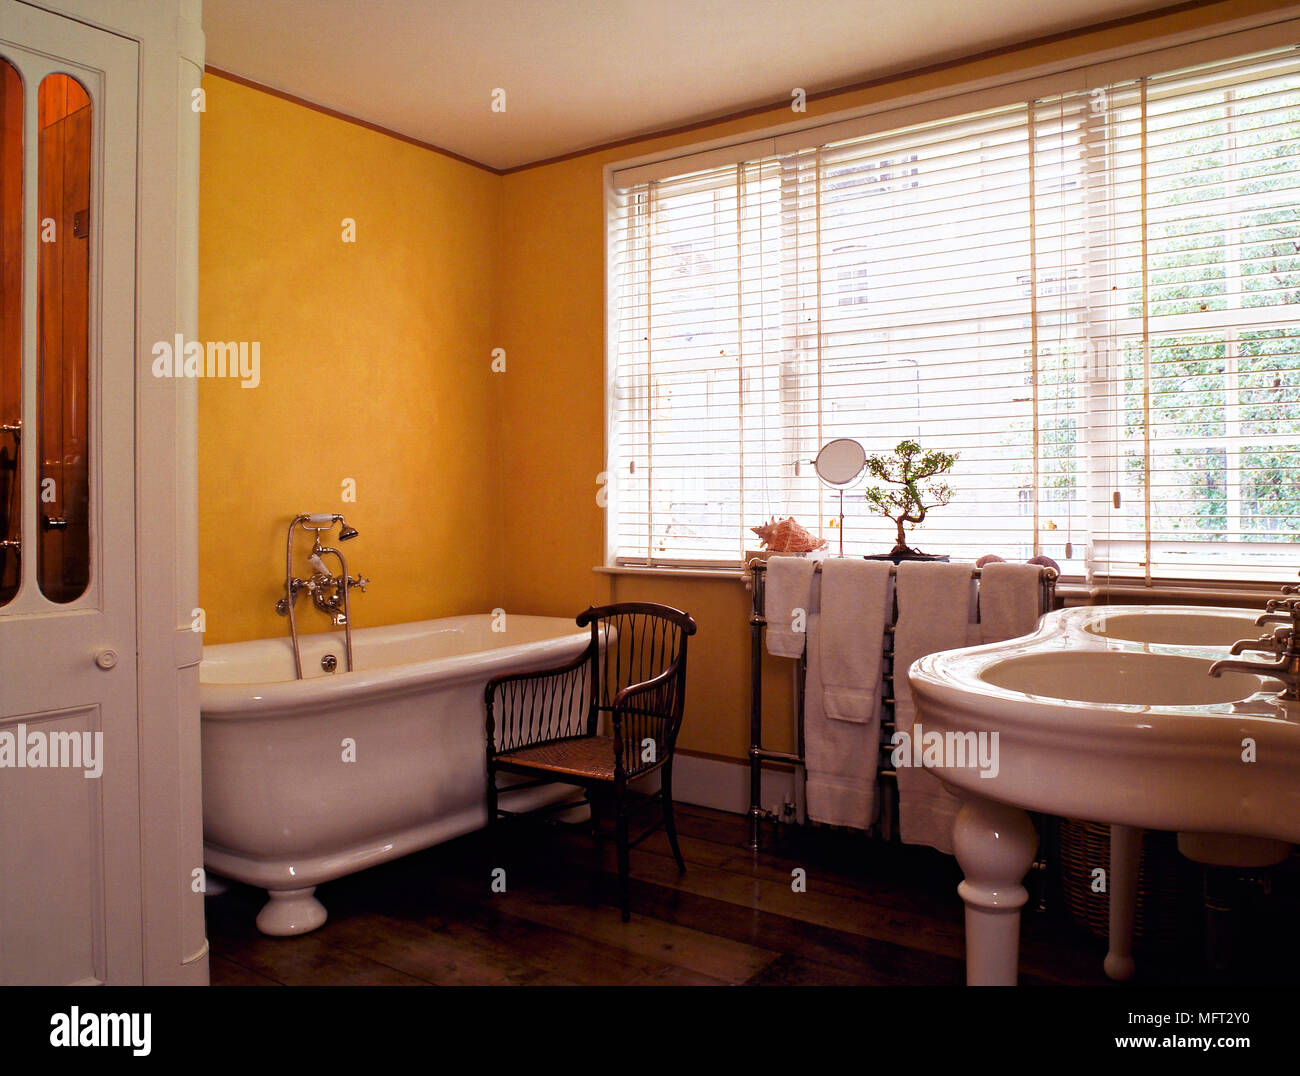 Traditional Yellow Bathroom Freestanding Roll Top Bath Twin Washbasin  Interiors Bathrooms Venetian Blinds Baths Sinks Period